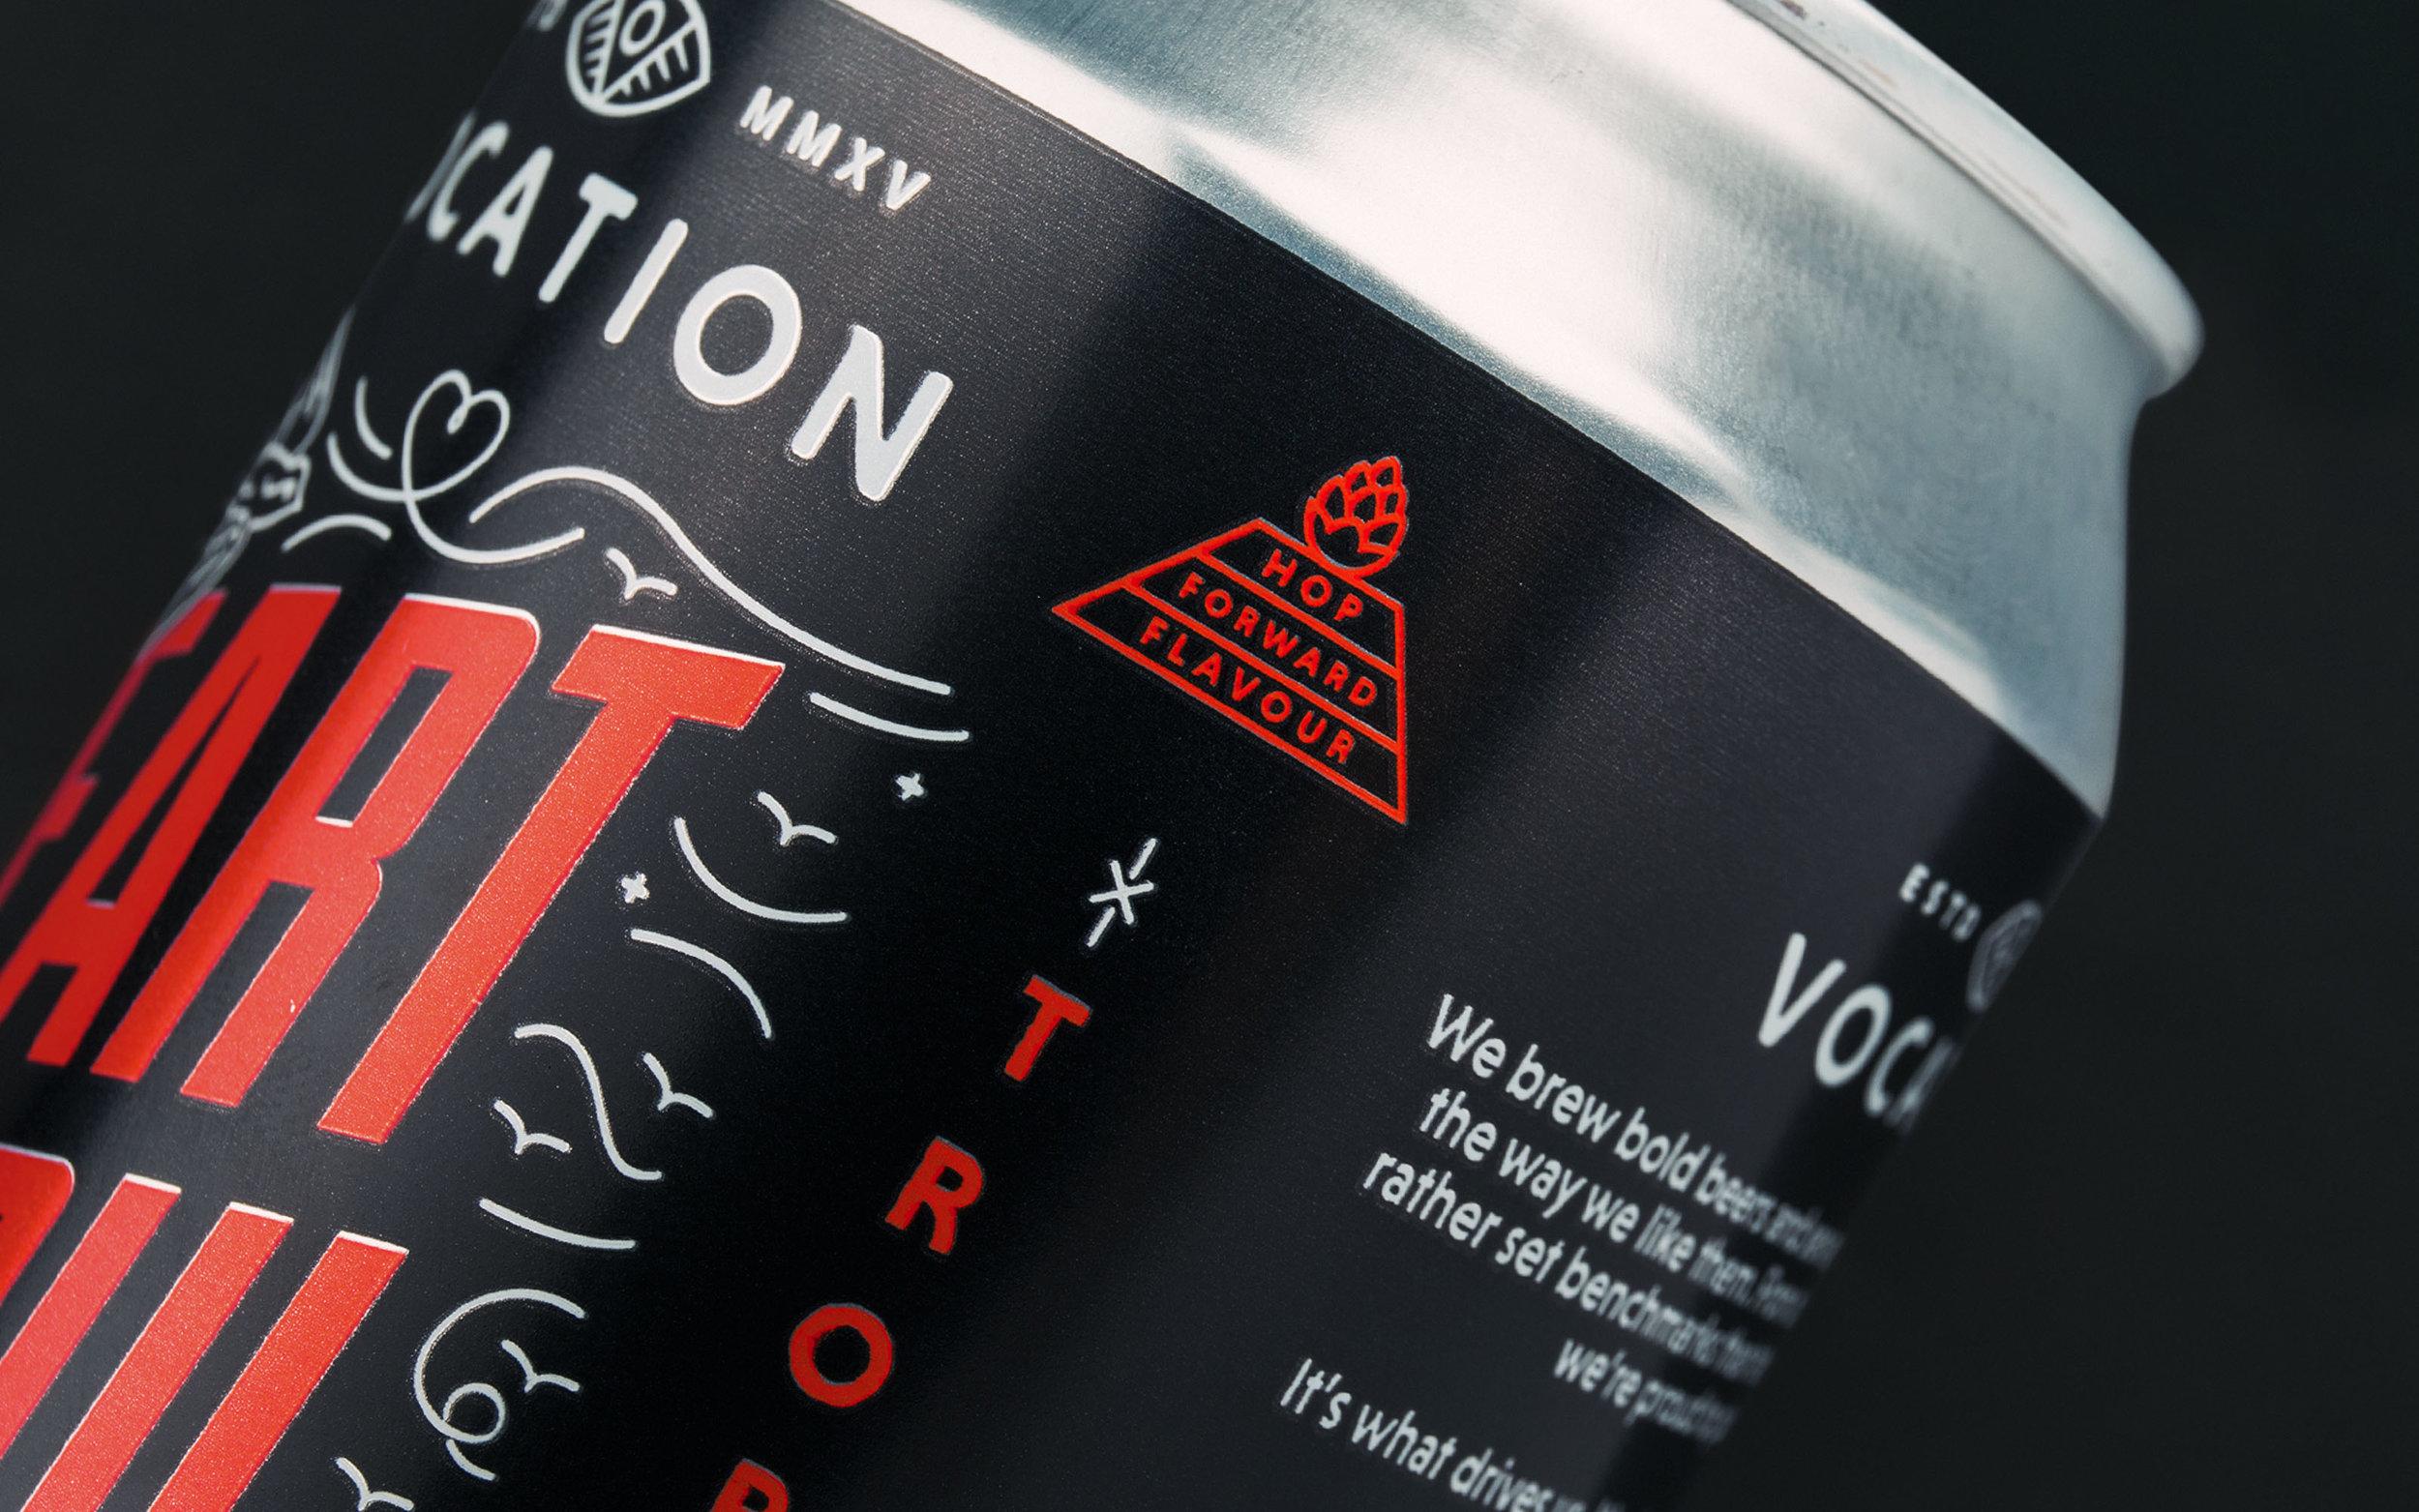 Robot Food - Vocation Brewery7.jpg